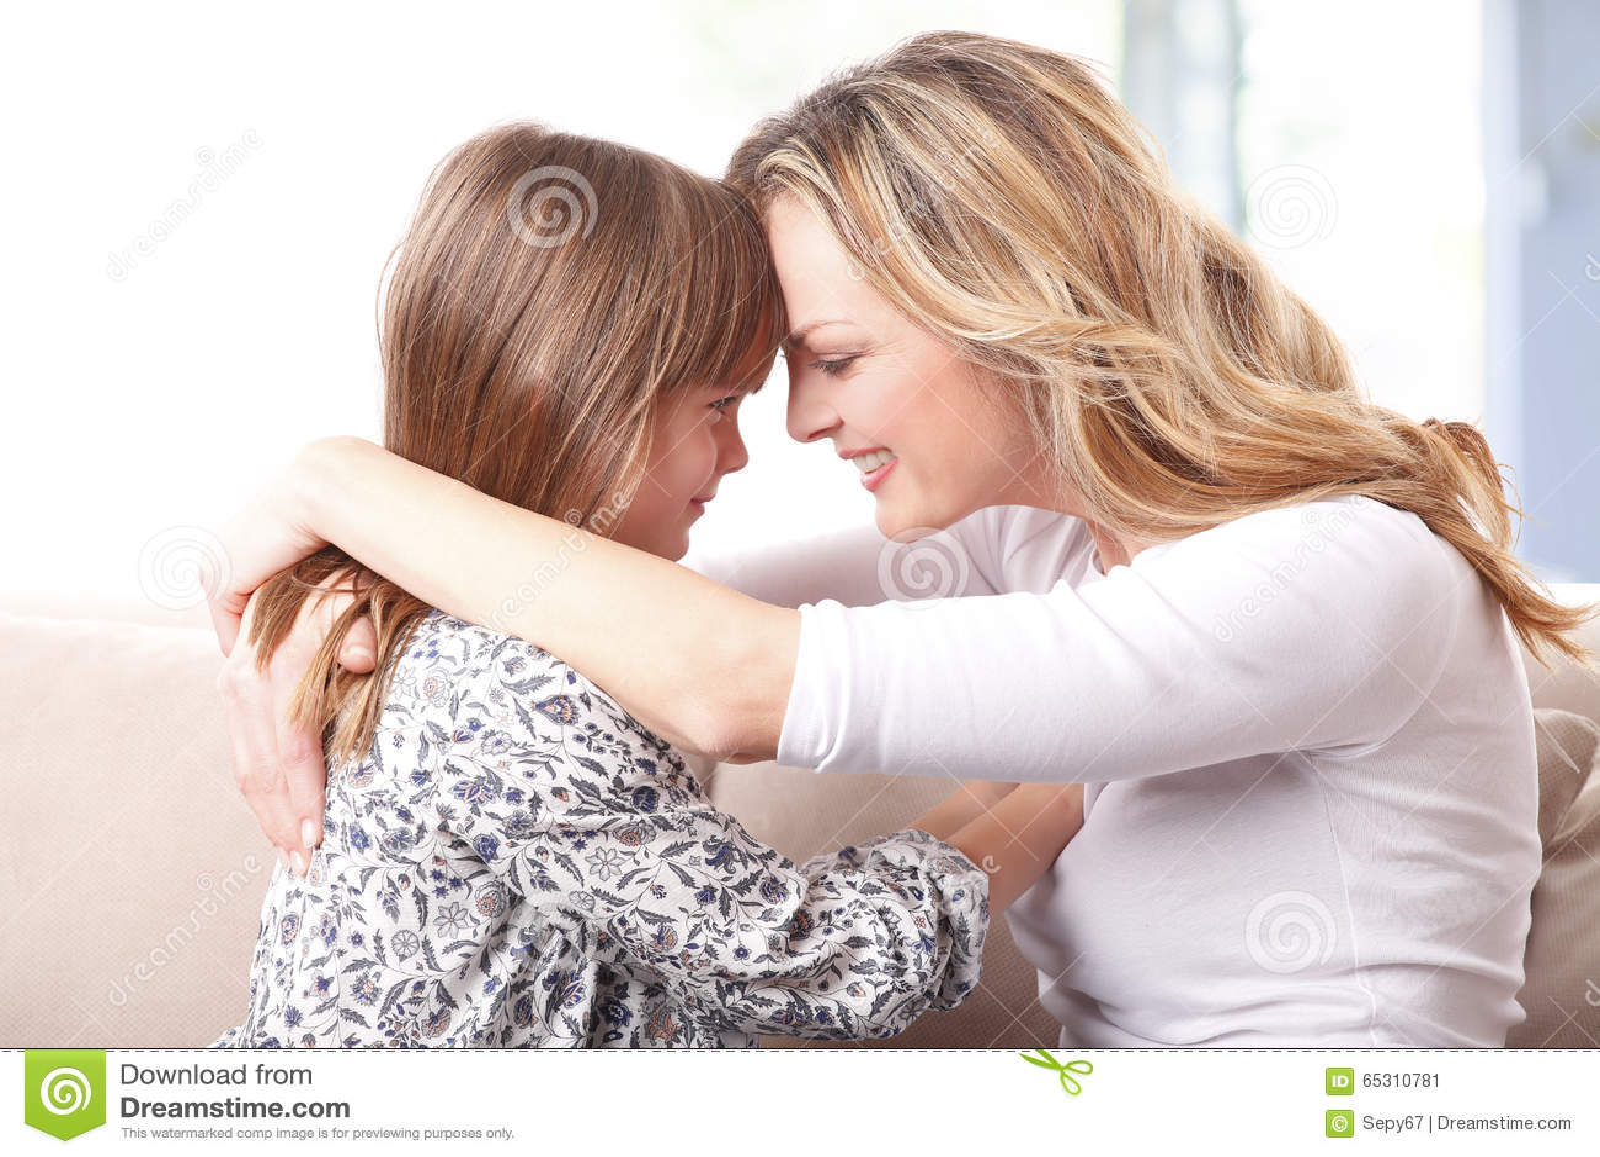 Loving Mother Daughter Relationship Stock Image